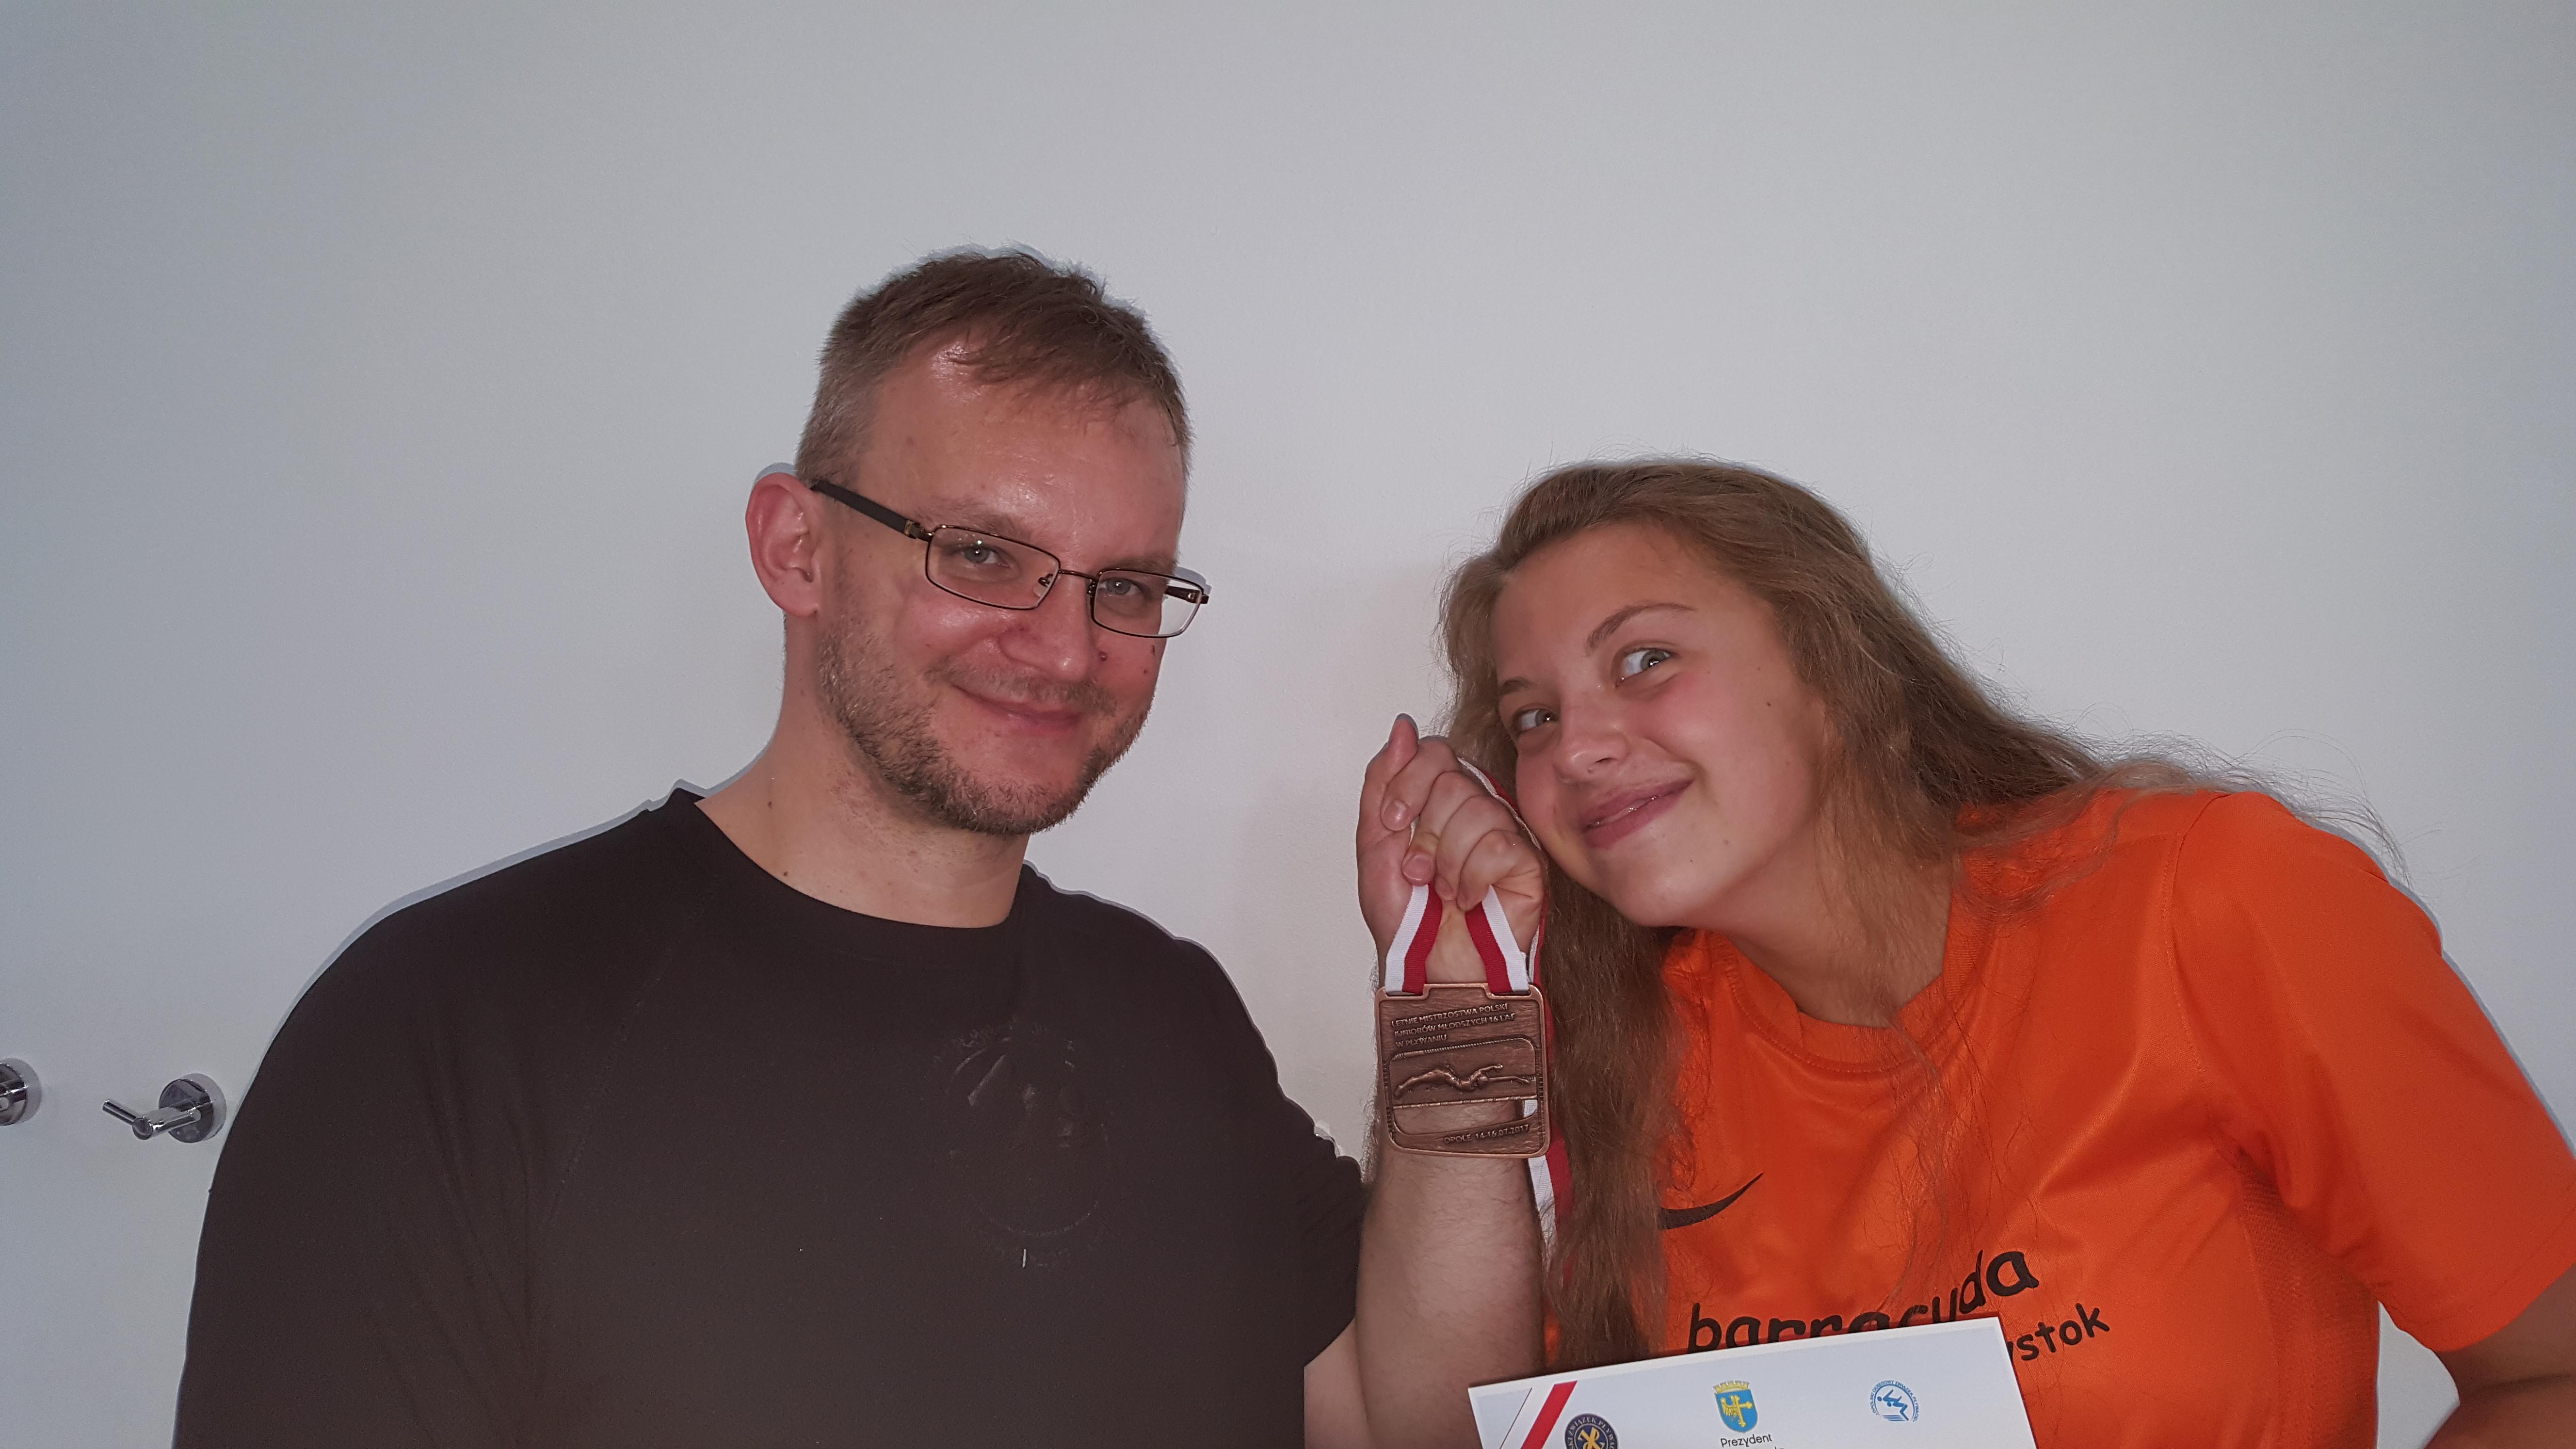 Adrian m i stara niemiecka kurwa - 2 2